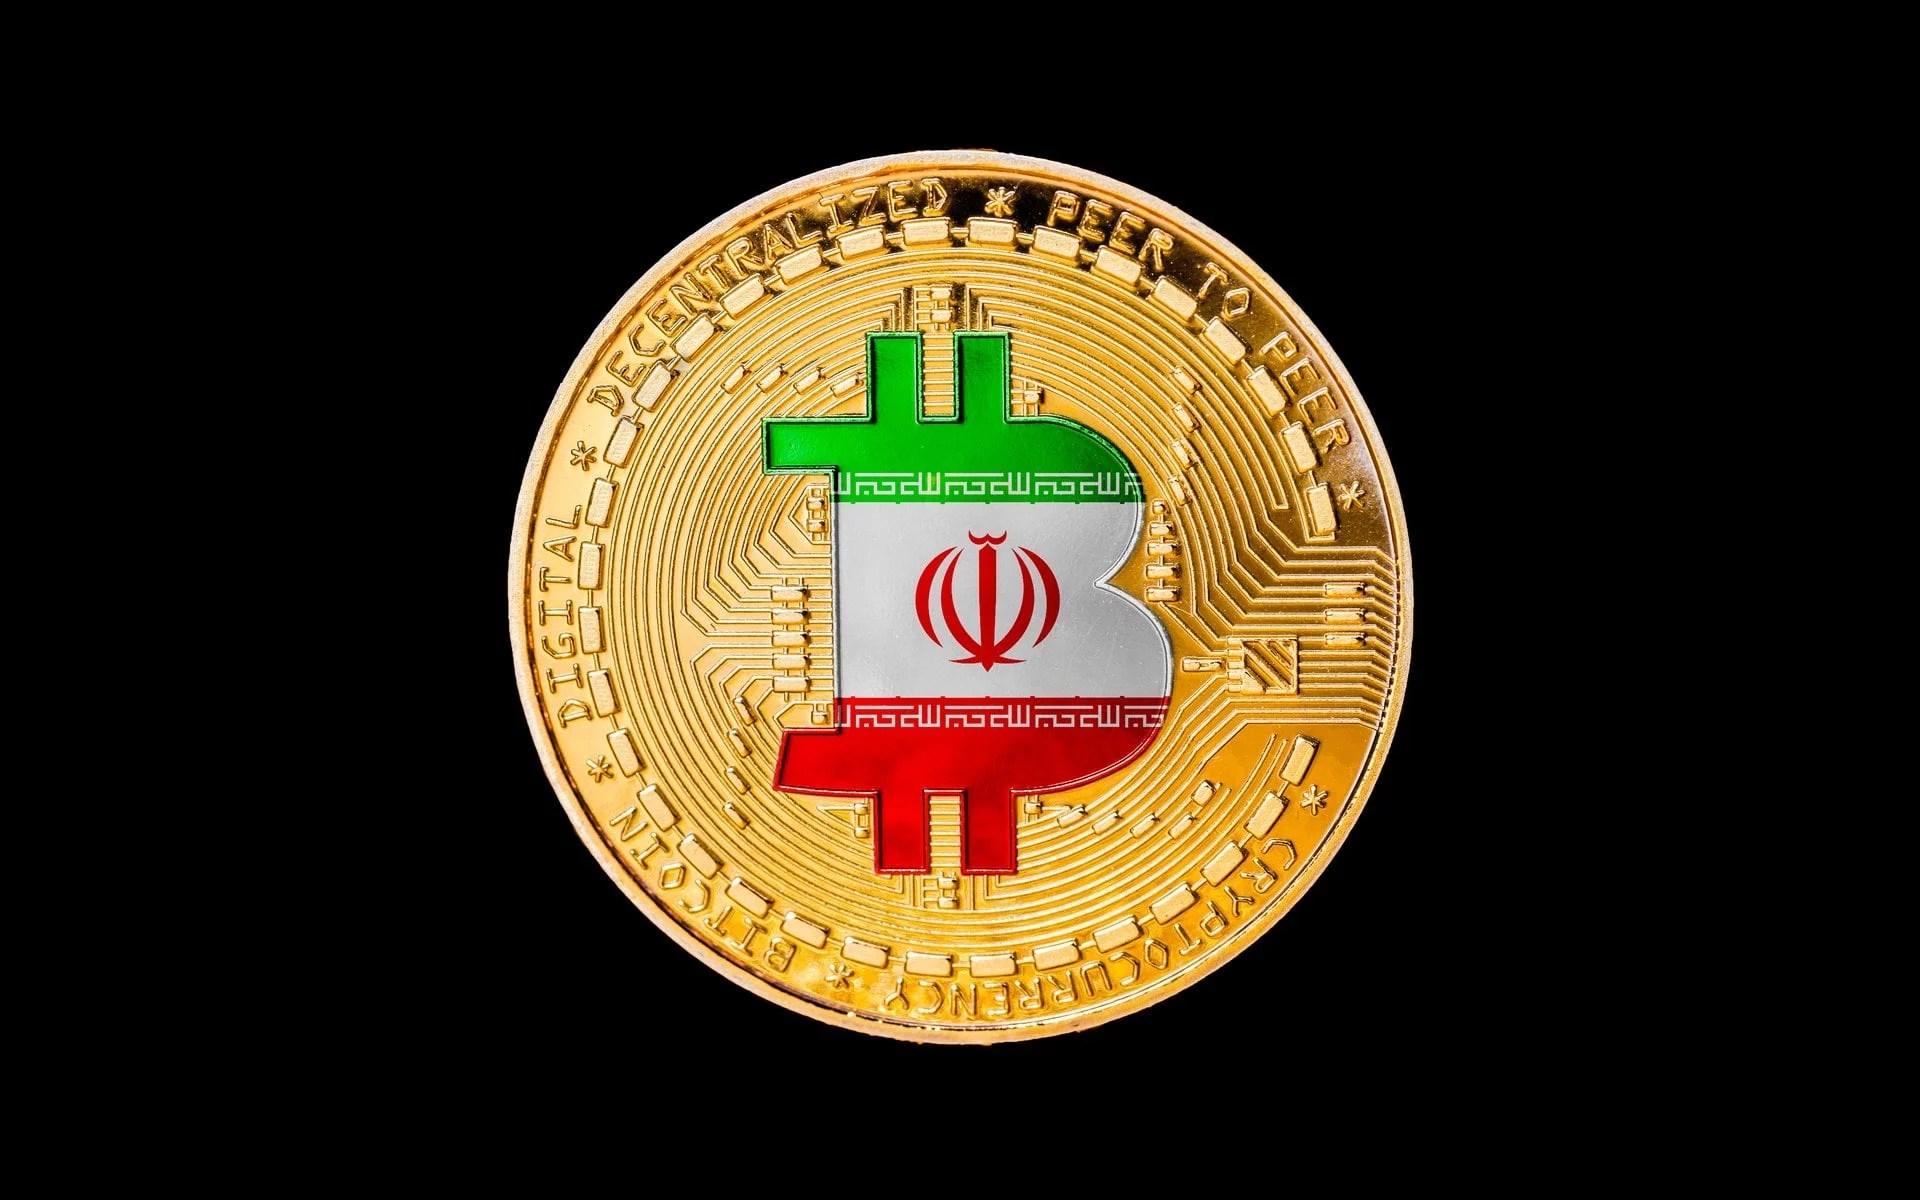 Iran acepta minar Bitcoin a pesar de la prohibición sobre el trading